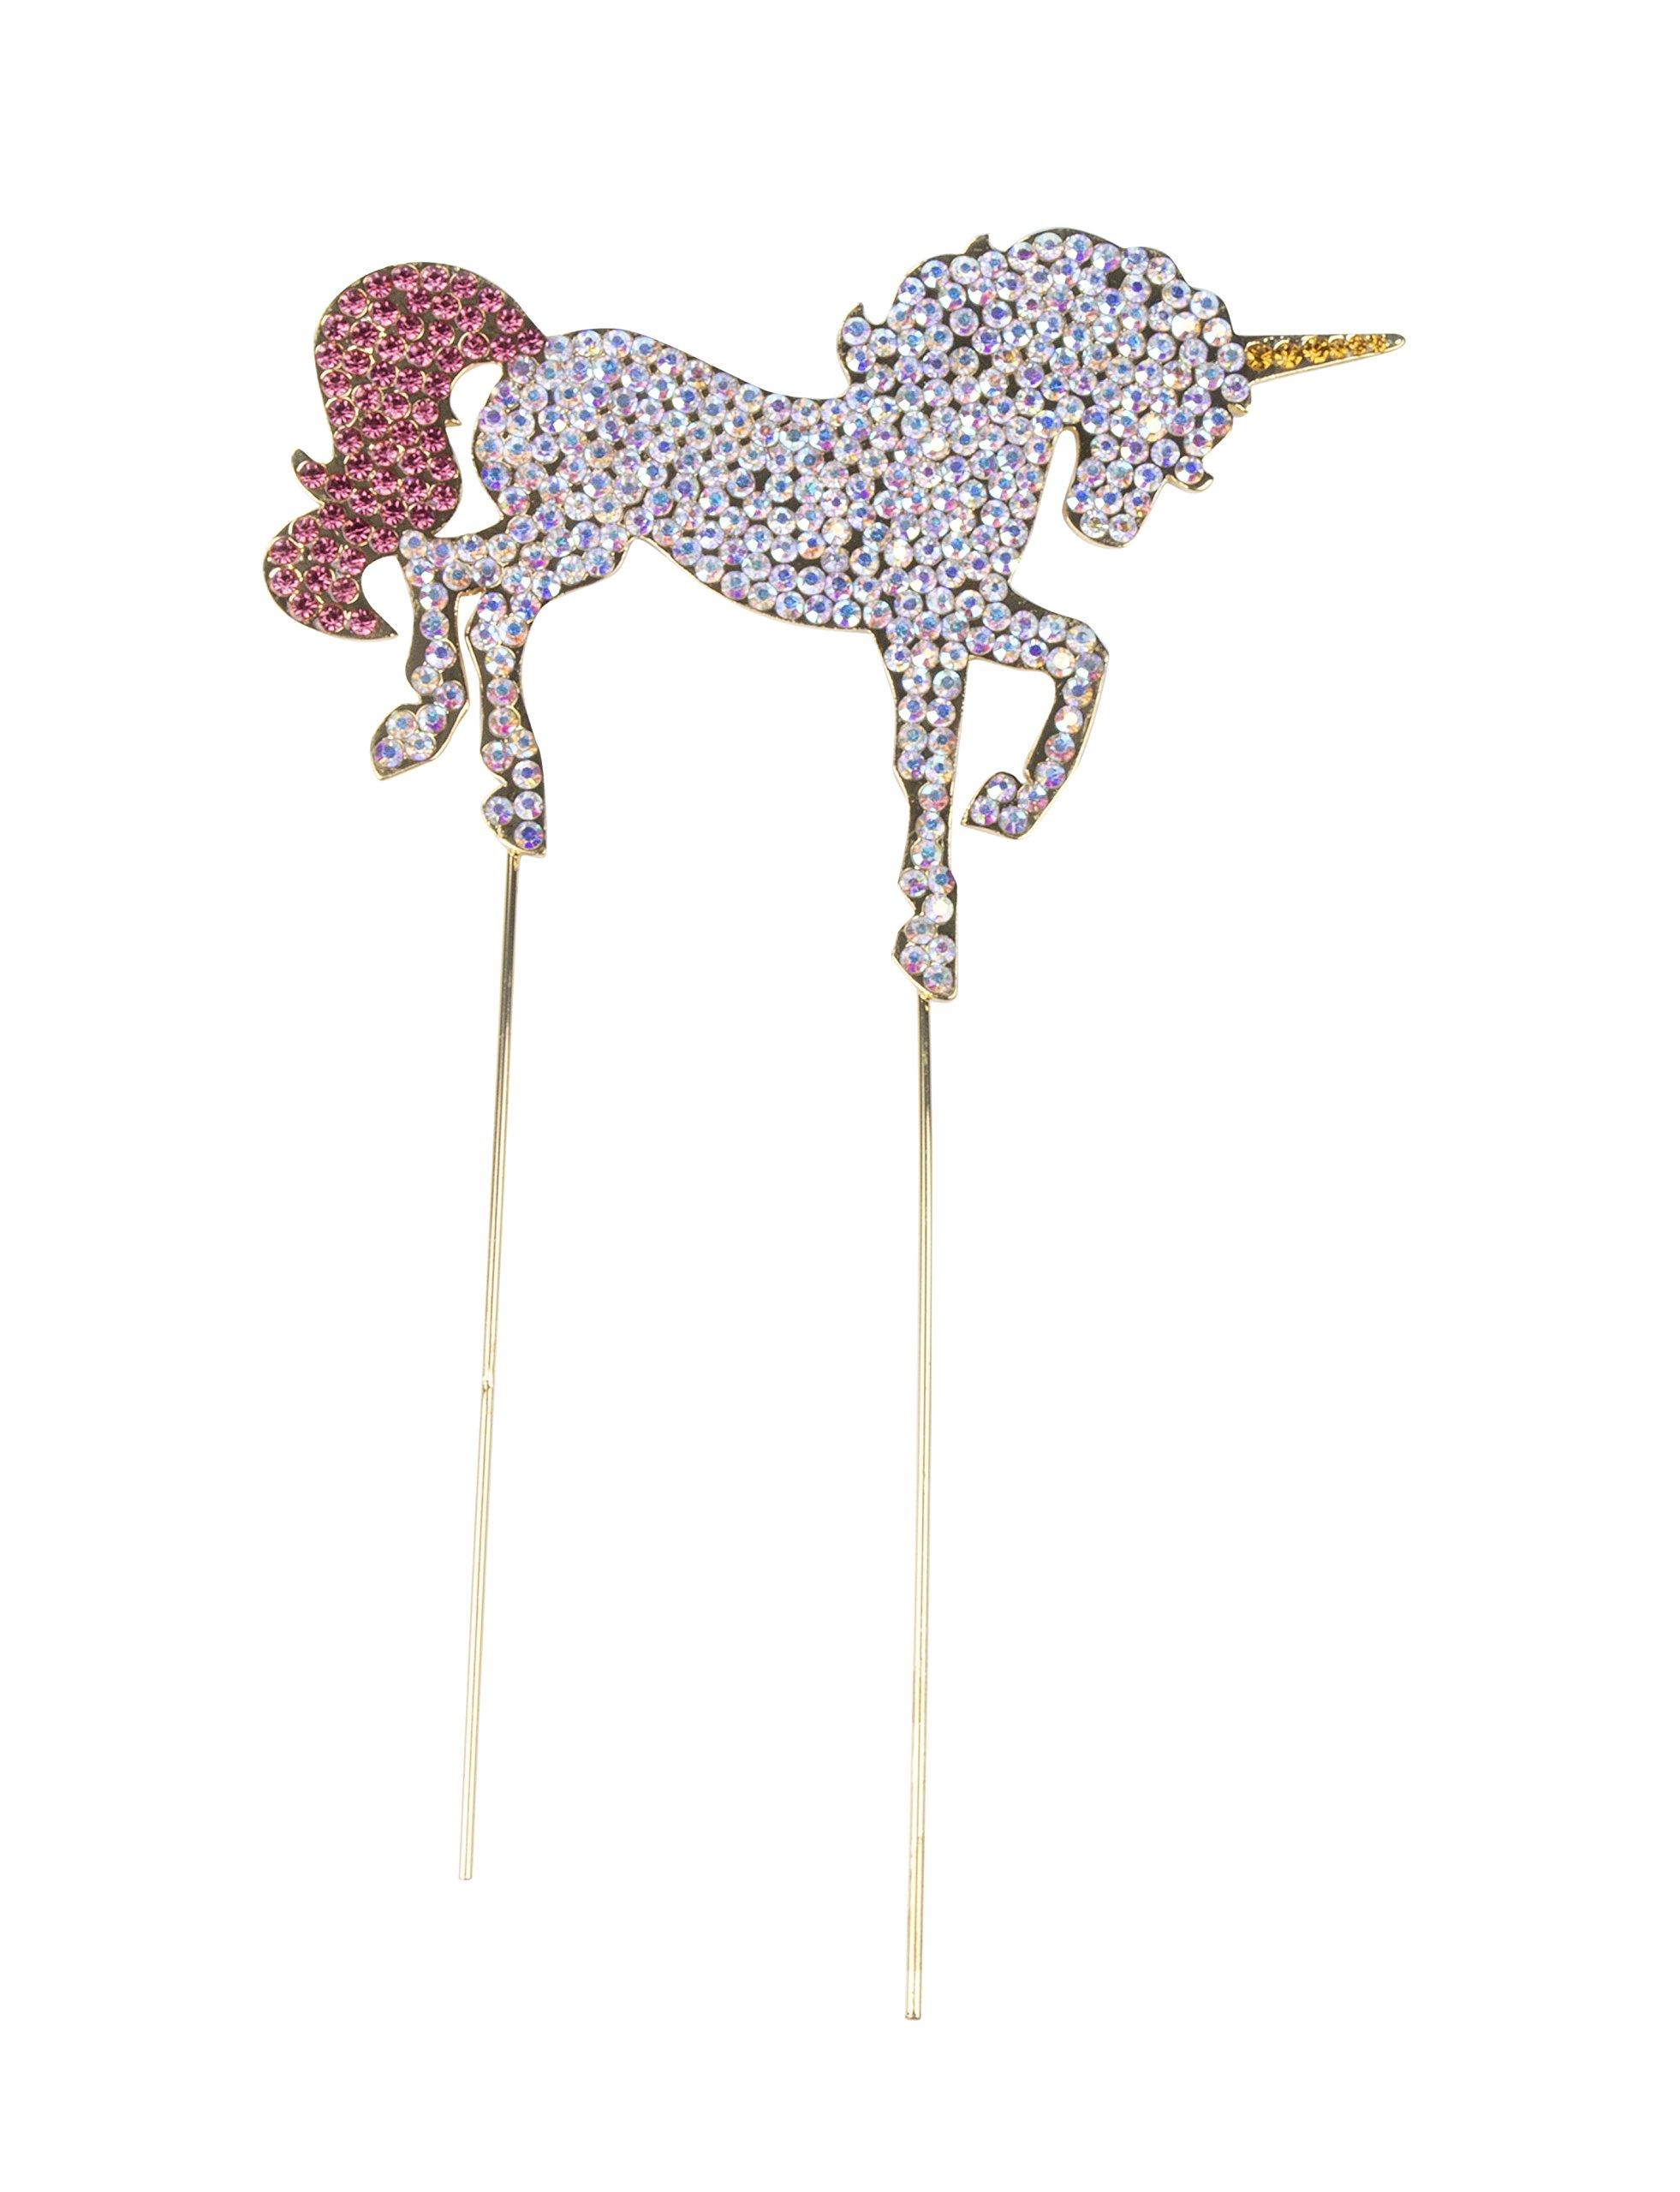 Unicorn Cake Topper - Cake Decoration, Rhinestone Cake Topper for Birthday, Girls Party, Bridal Shower, Baby Shower, Unicorn Design